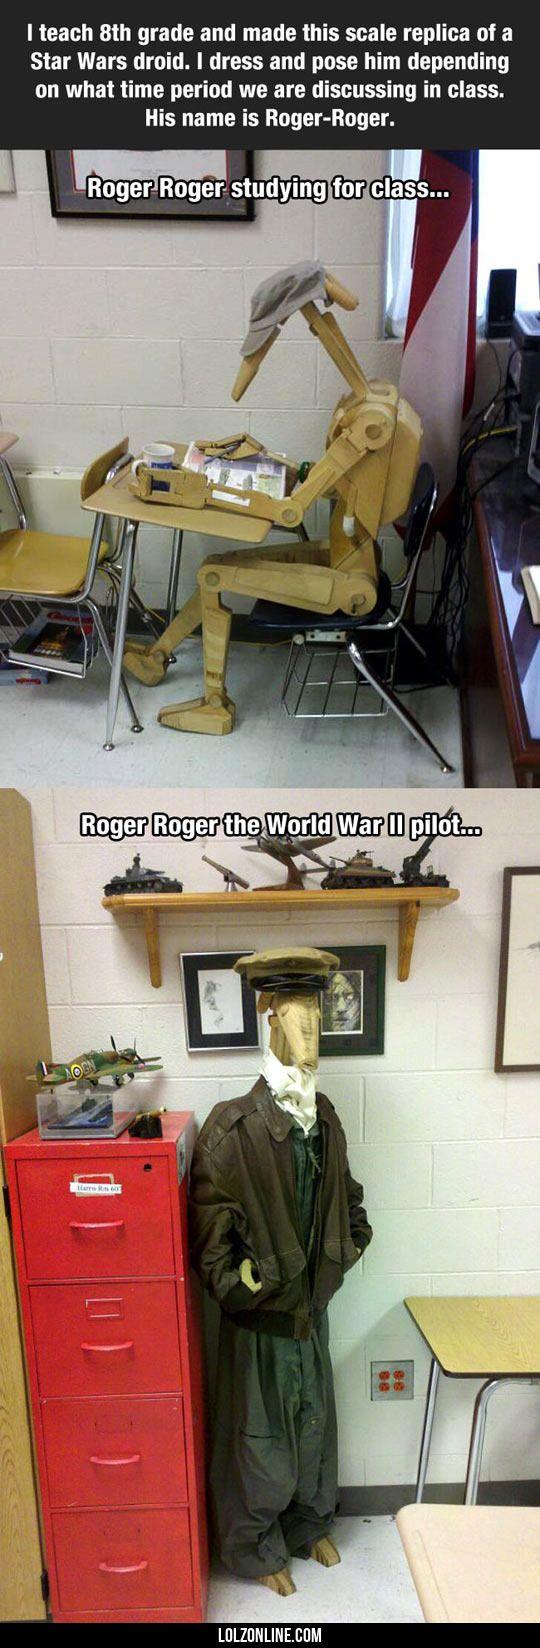 When The 8th Grade Teacher Is A Star Wars Fan #haha #funny